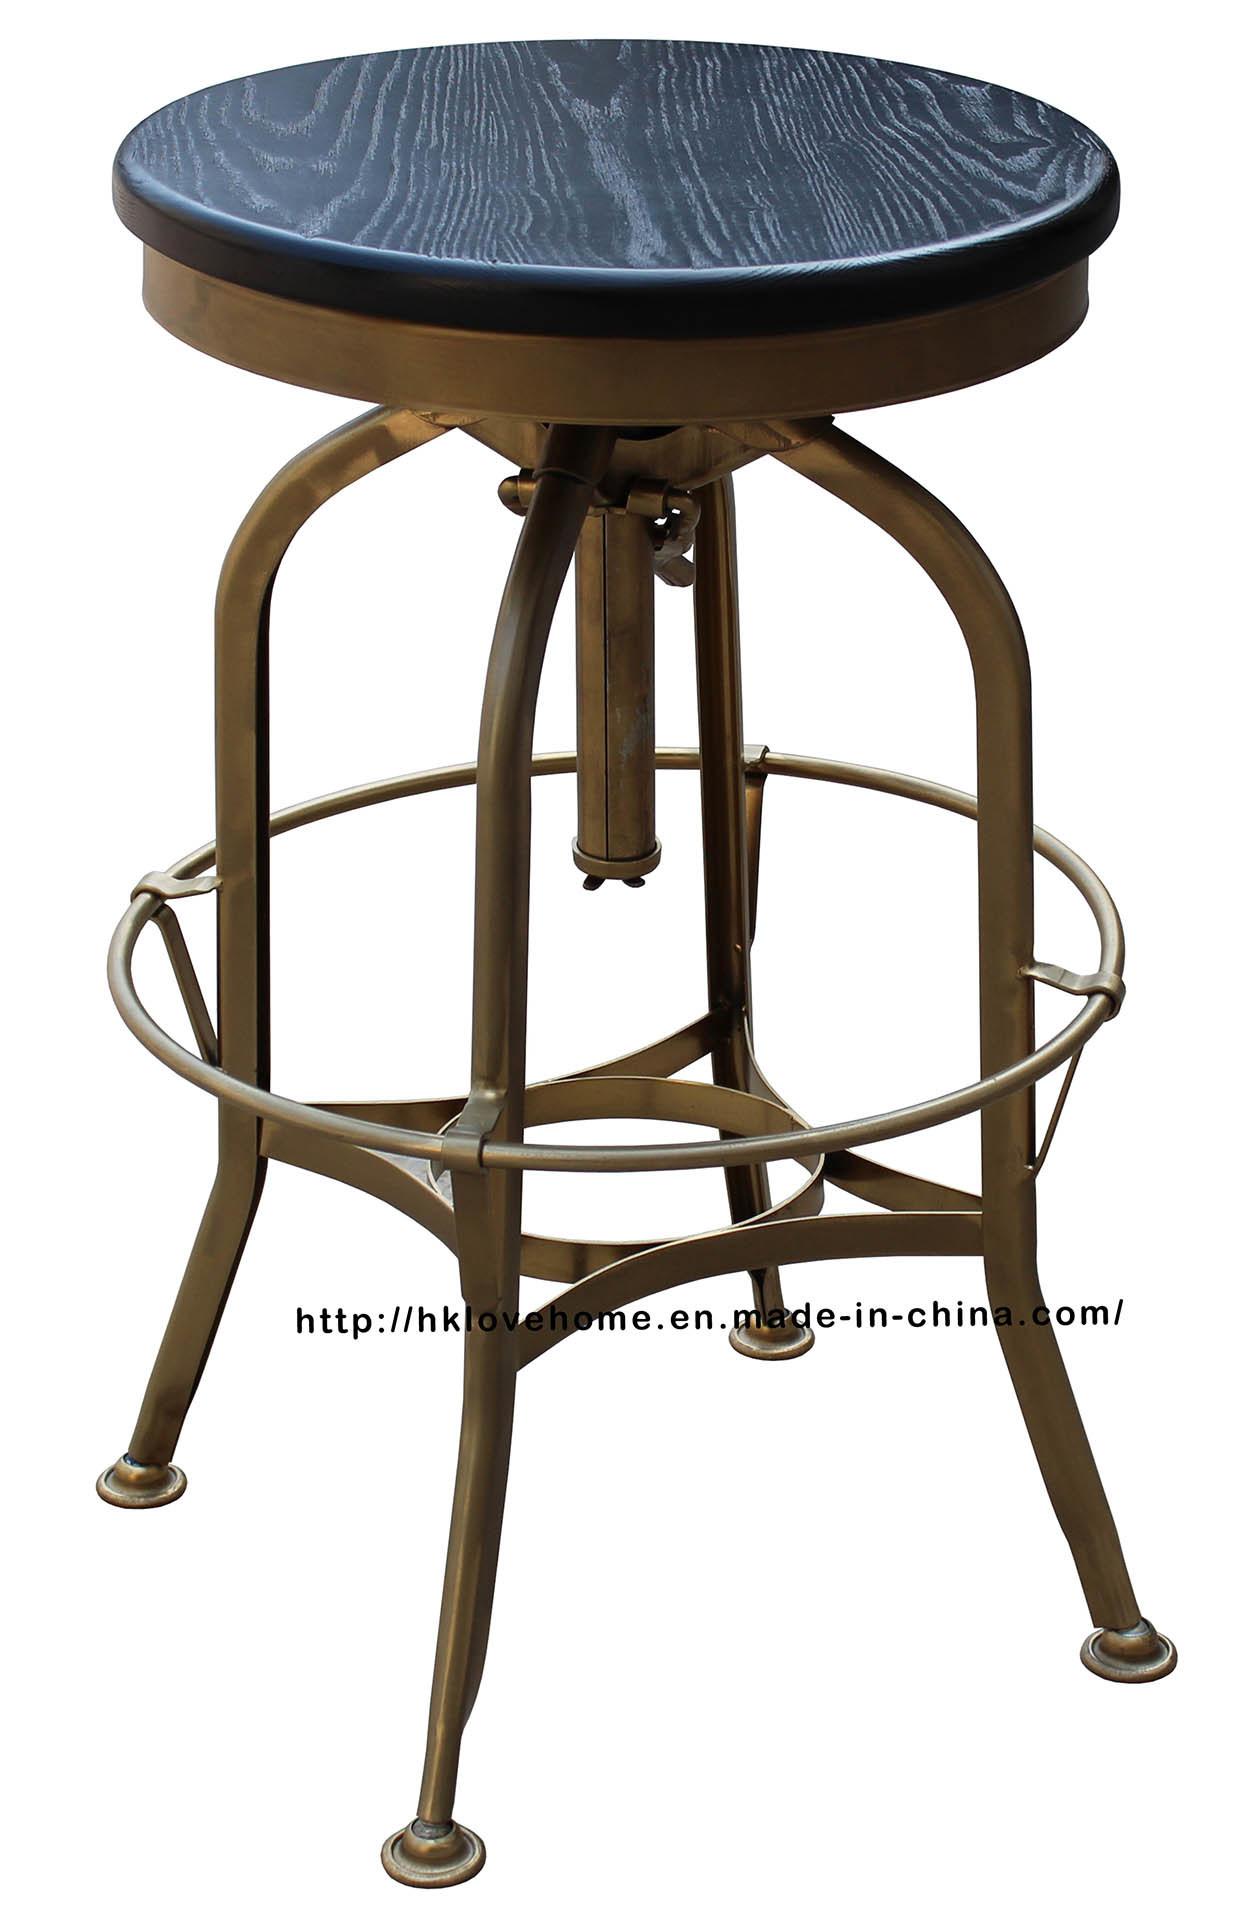 Industrial Metal Furniture Steel Turner Vintage Toledo Bar Stools